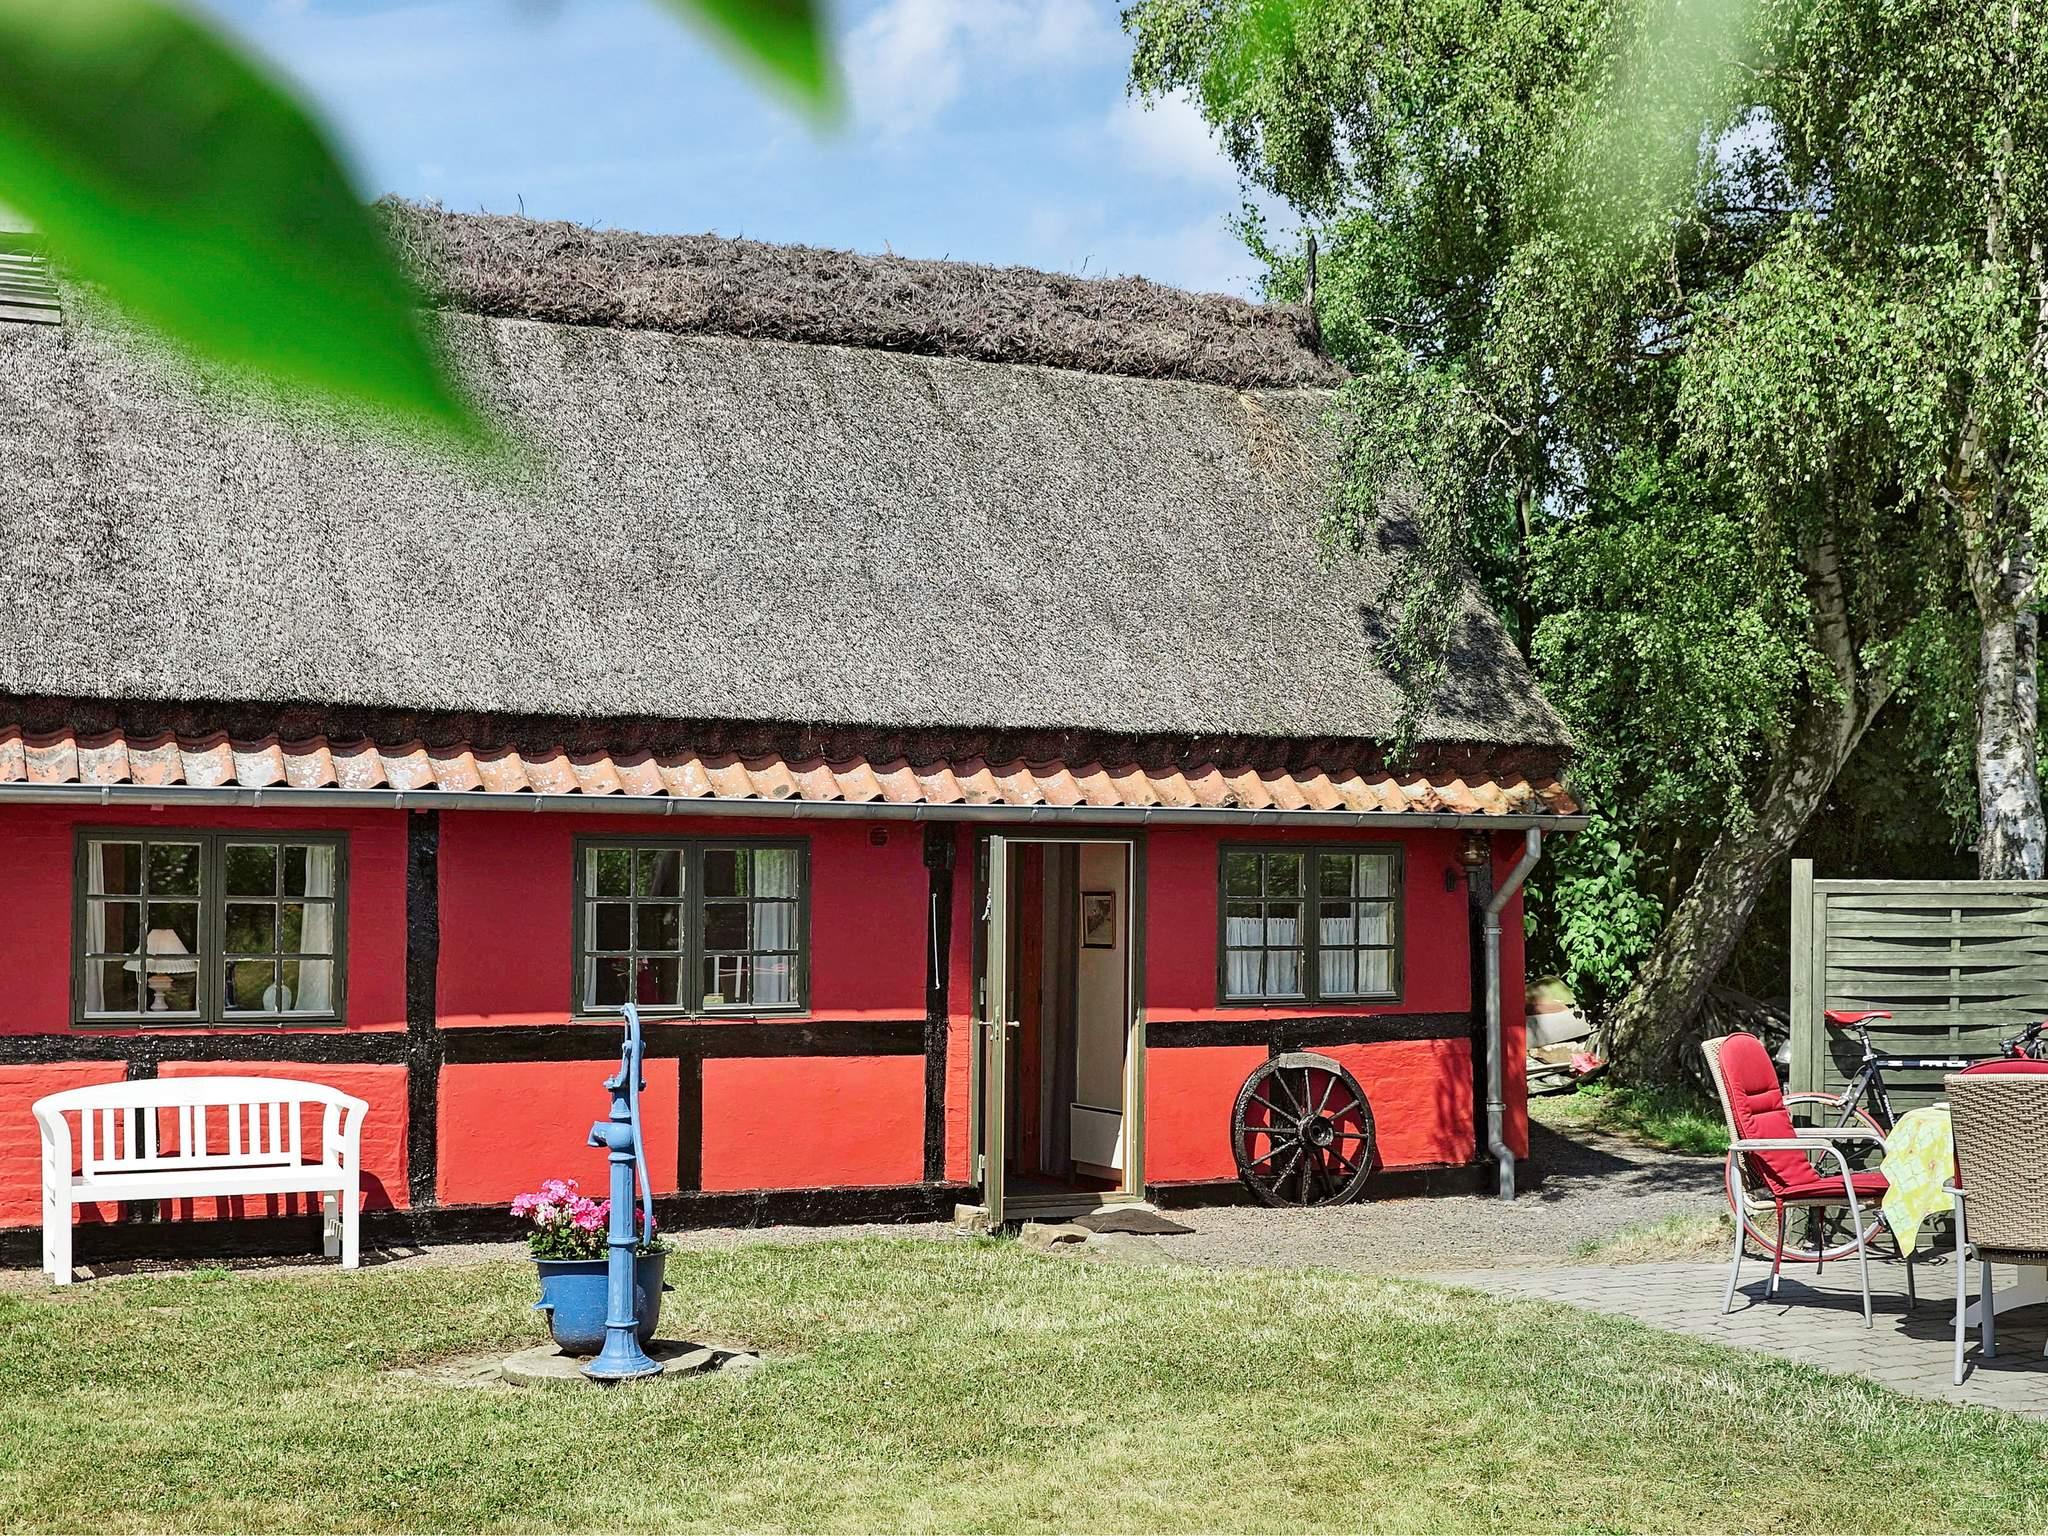 Ferienhaus Balka Strand (81872), Balke, , Bornholm, Dänemark, Bild 18